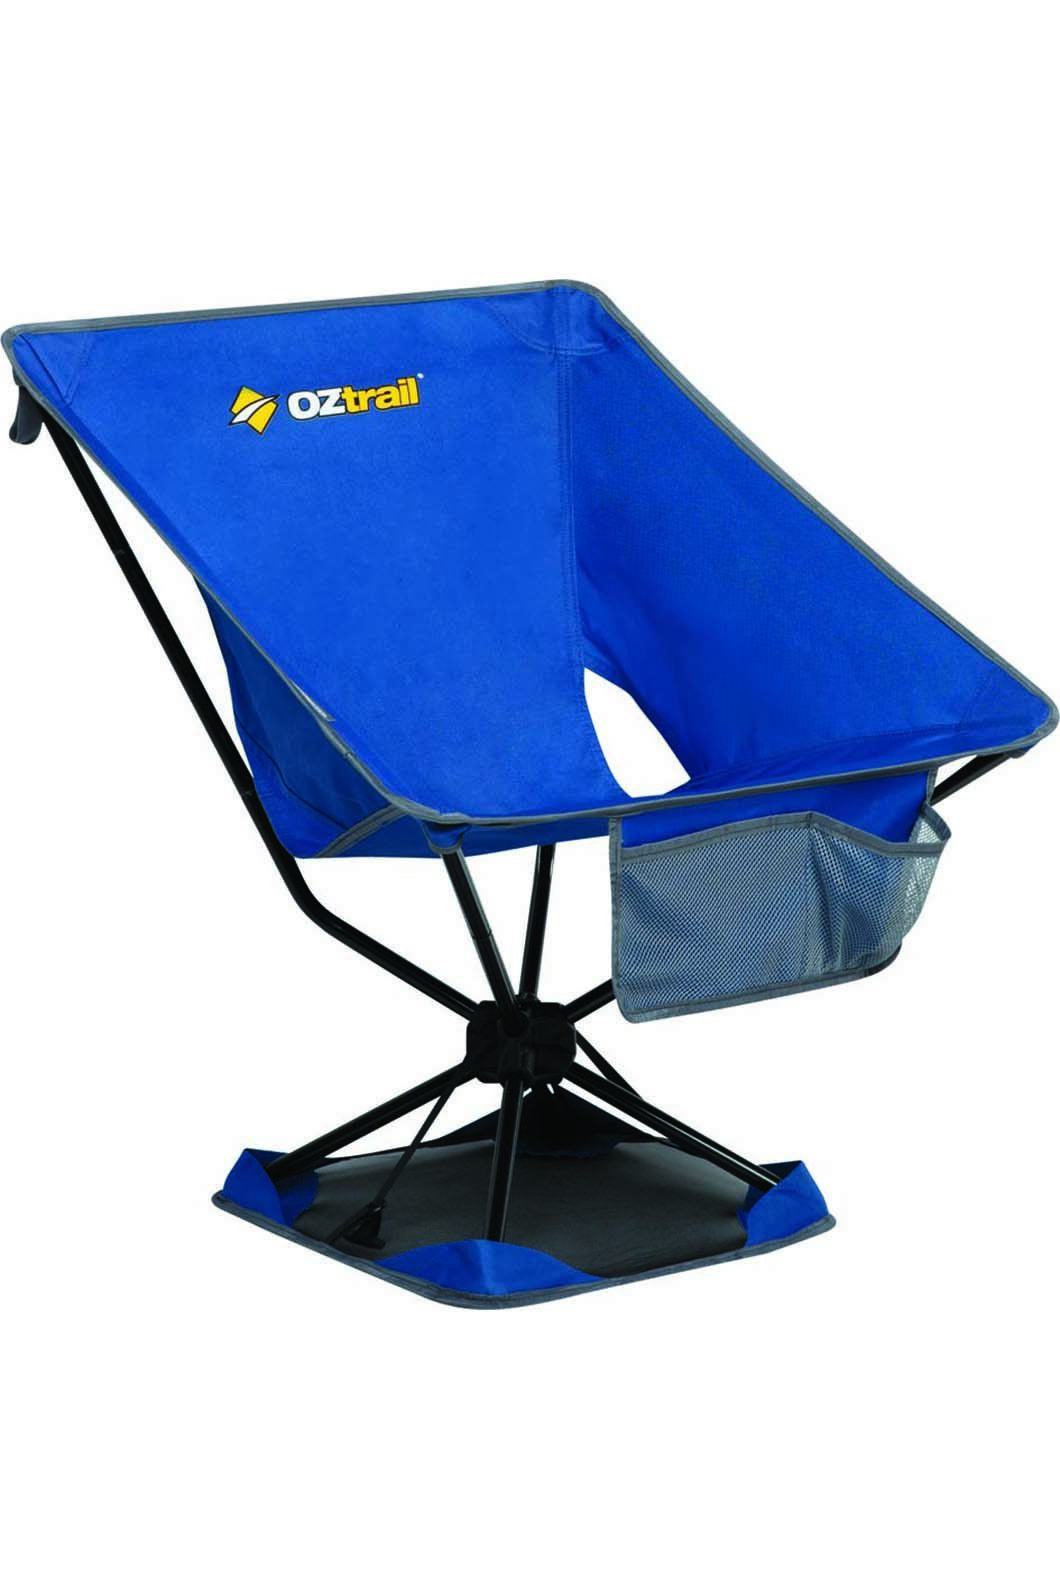 OZtrail Compaclite Traveller Hiking Chair, None, hi-res